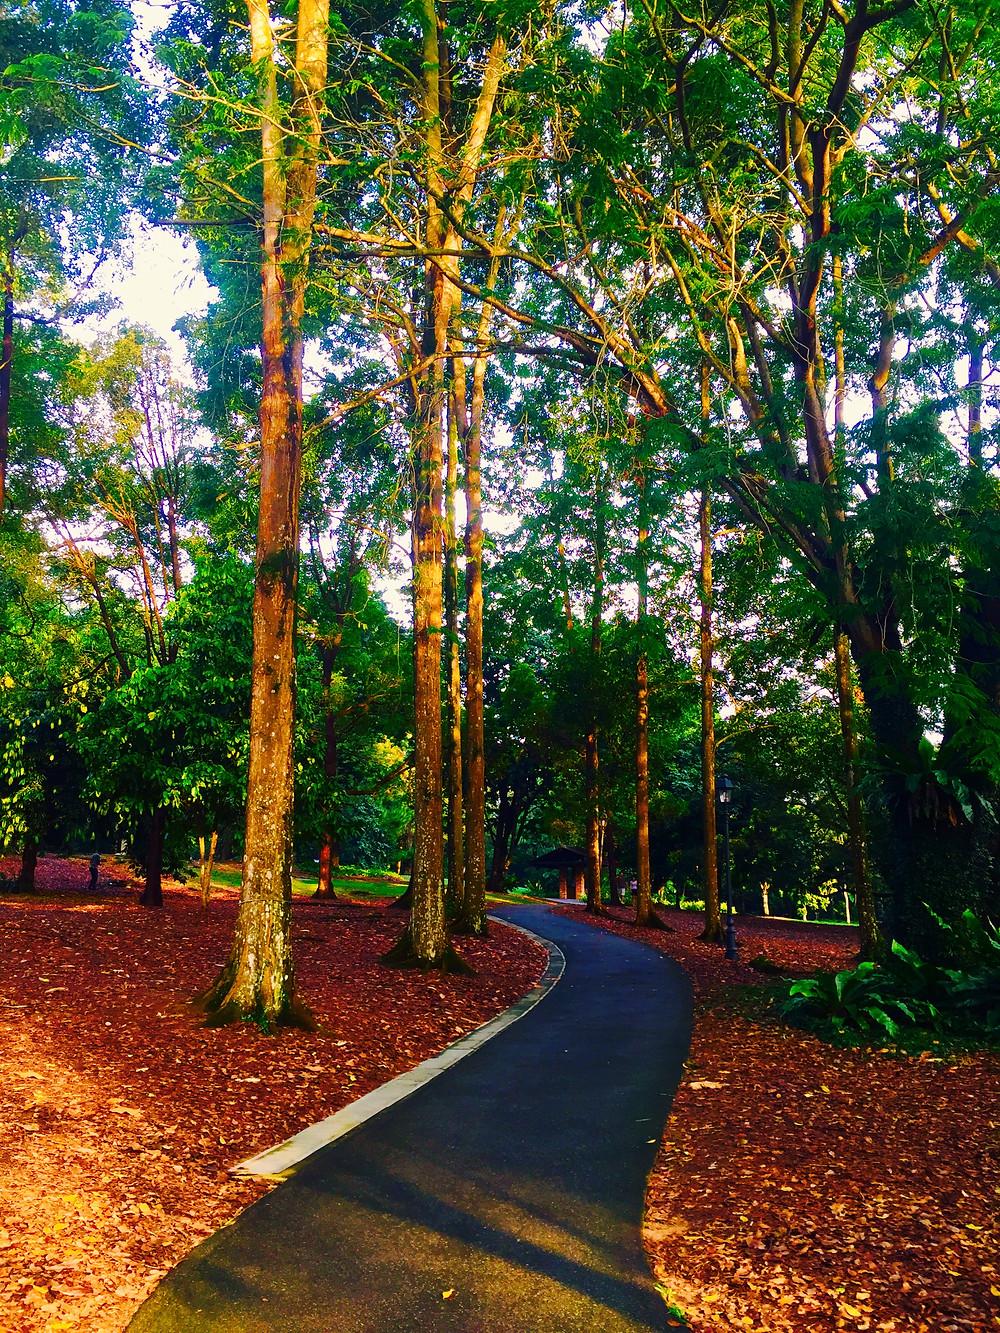 Singapore Botanical Gardens - a short stroll away.